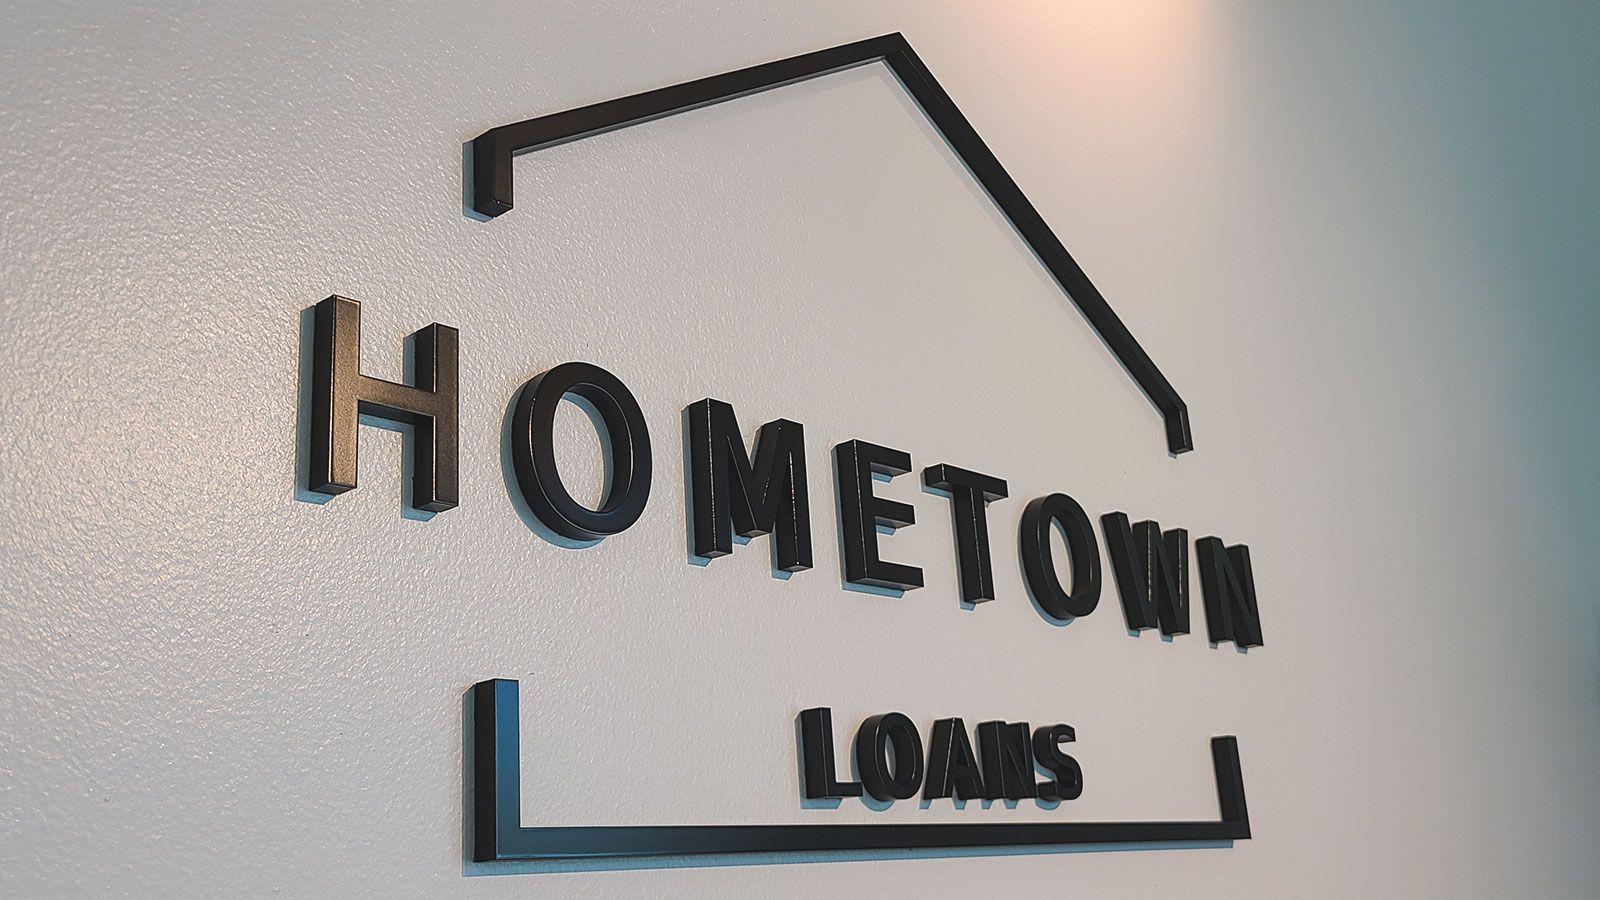 Hometown loans 3D letters